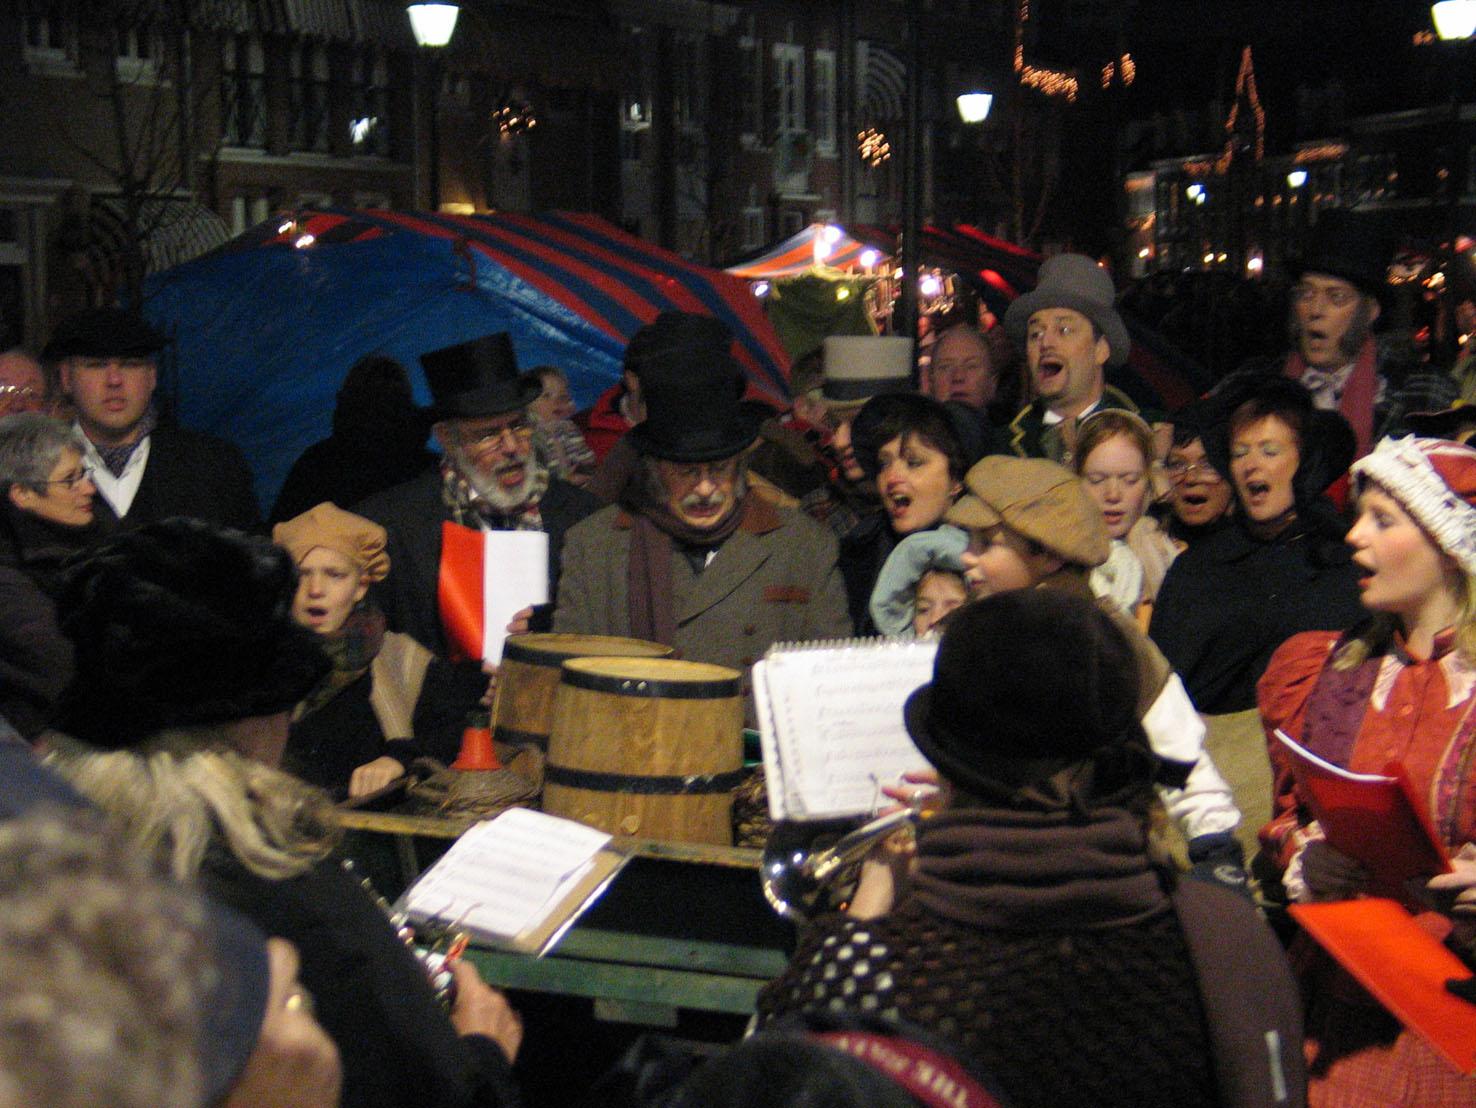 065 - Kerstmarkt Helmond 2003.jpg